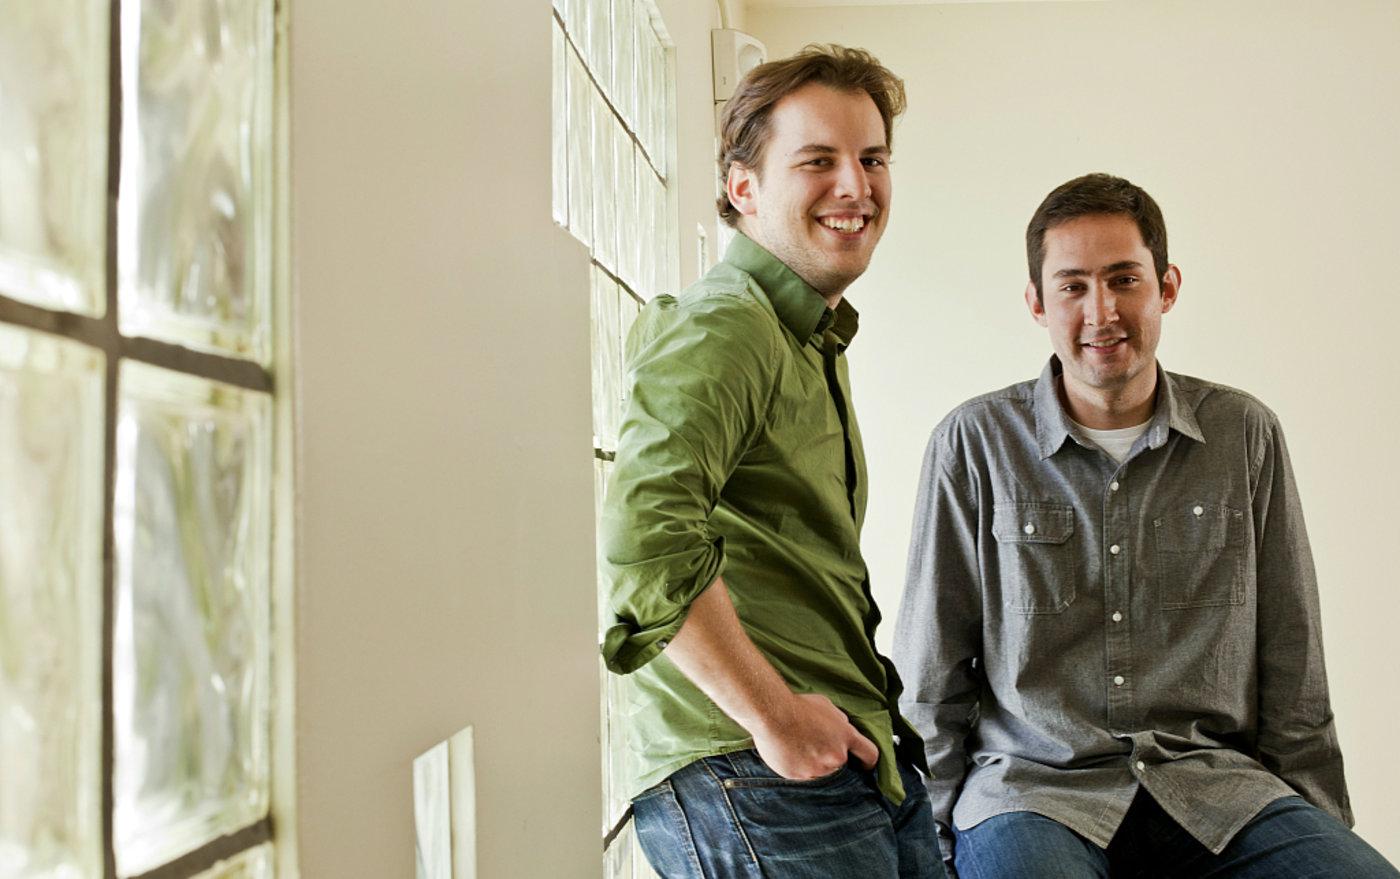 Instagram联合创始人凯文·斯特罗姆(Kevin Systrom)和迈克·克里格(Mike Krieger)